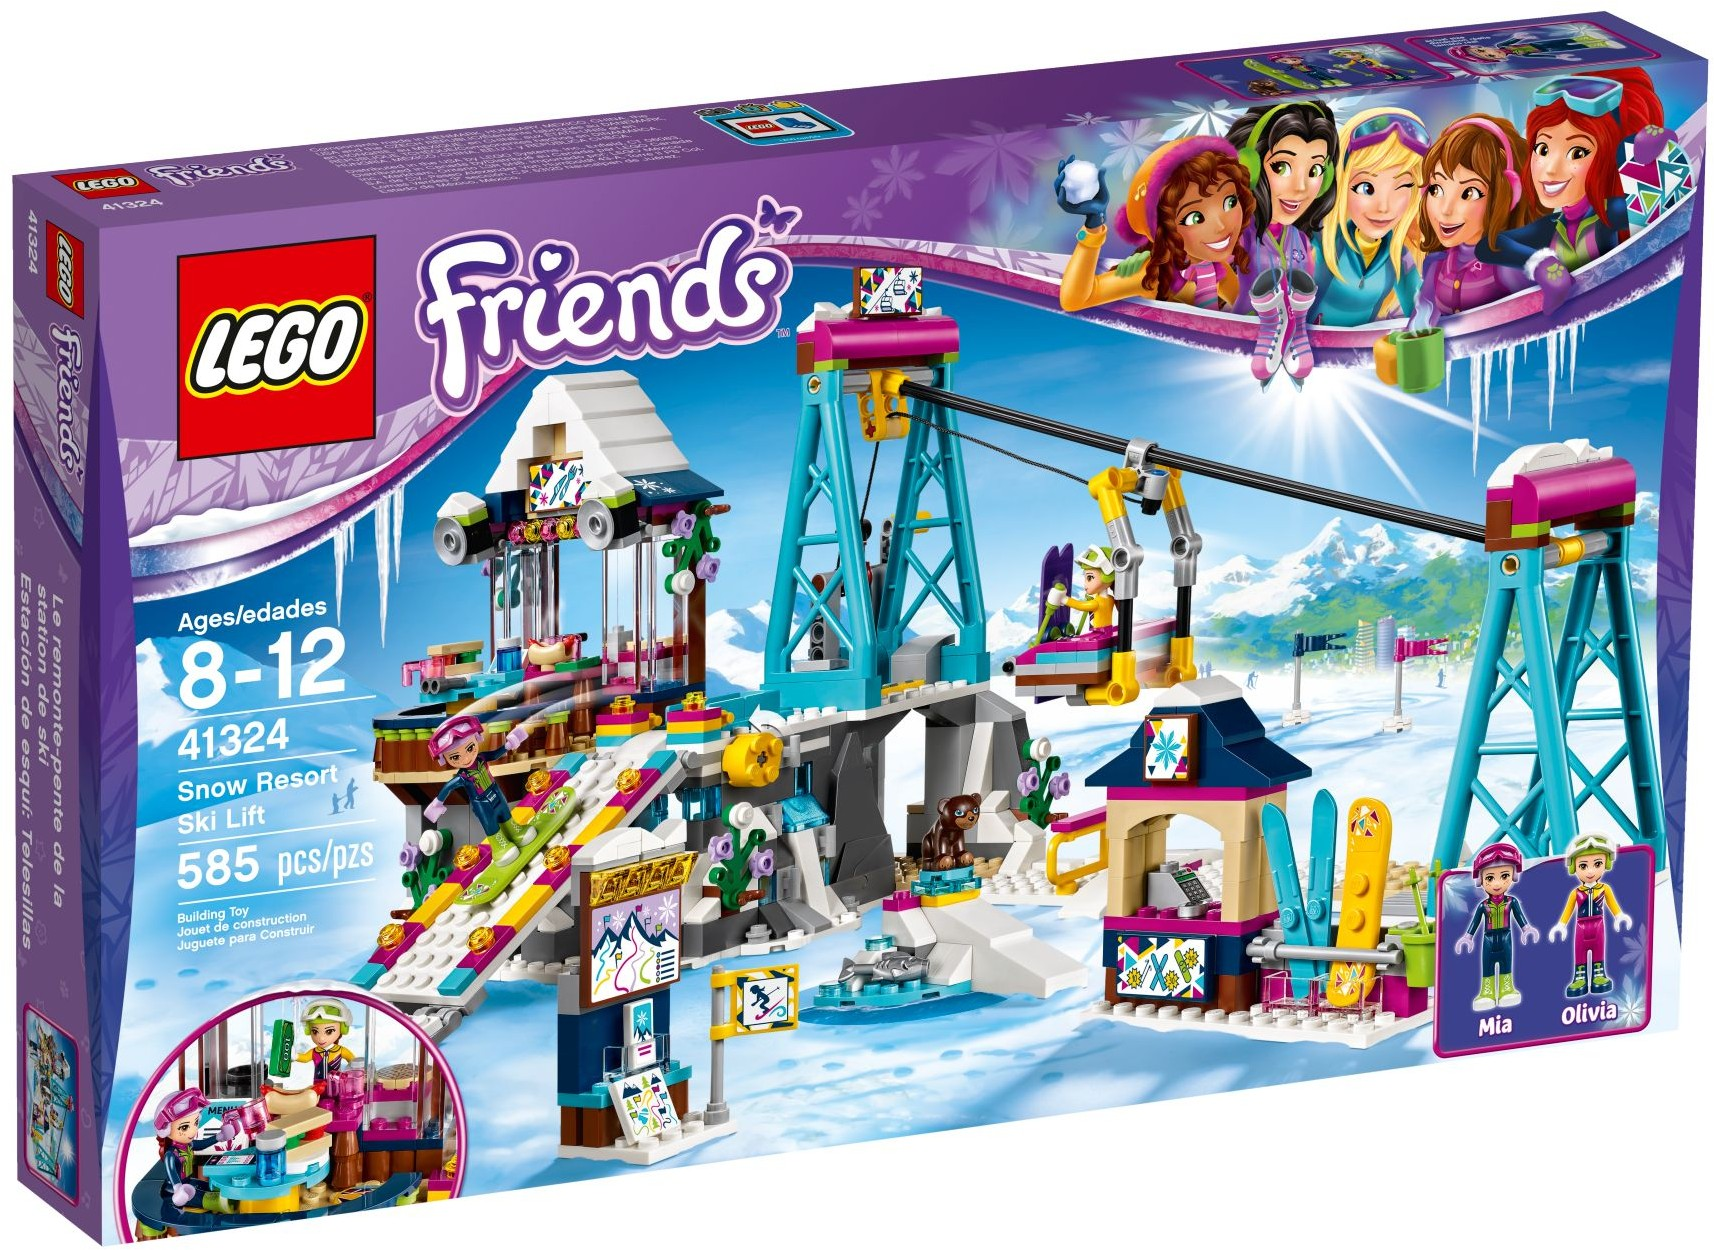 Lego Friends 41324 Snow Resort Ski Lift Review Brickset Lego Set